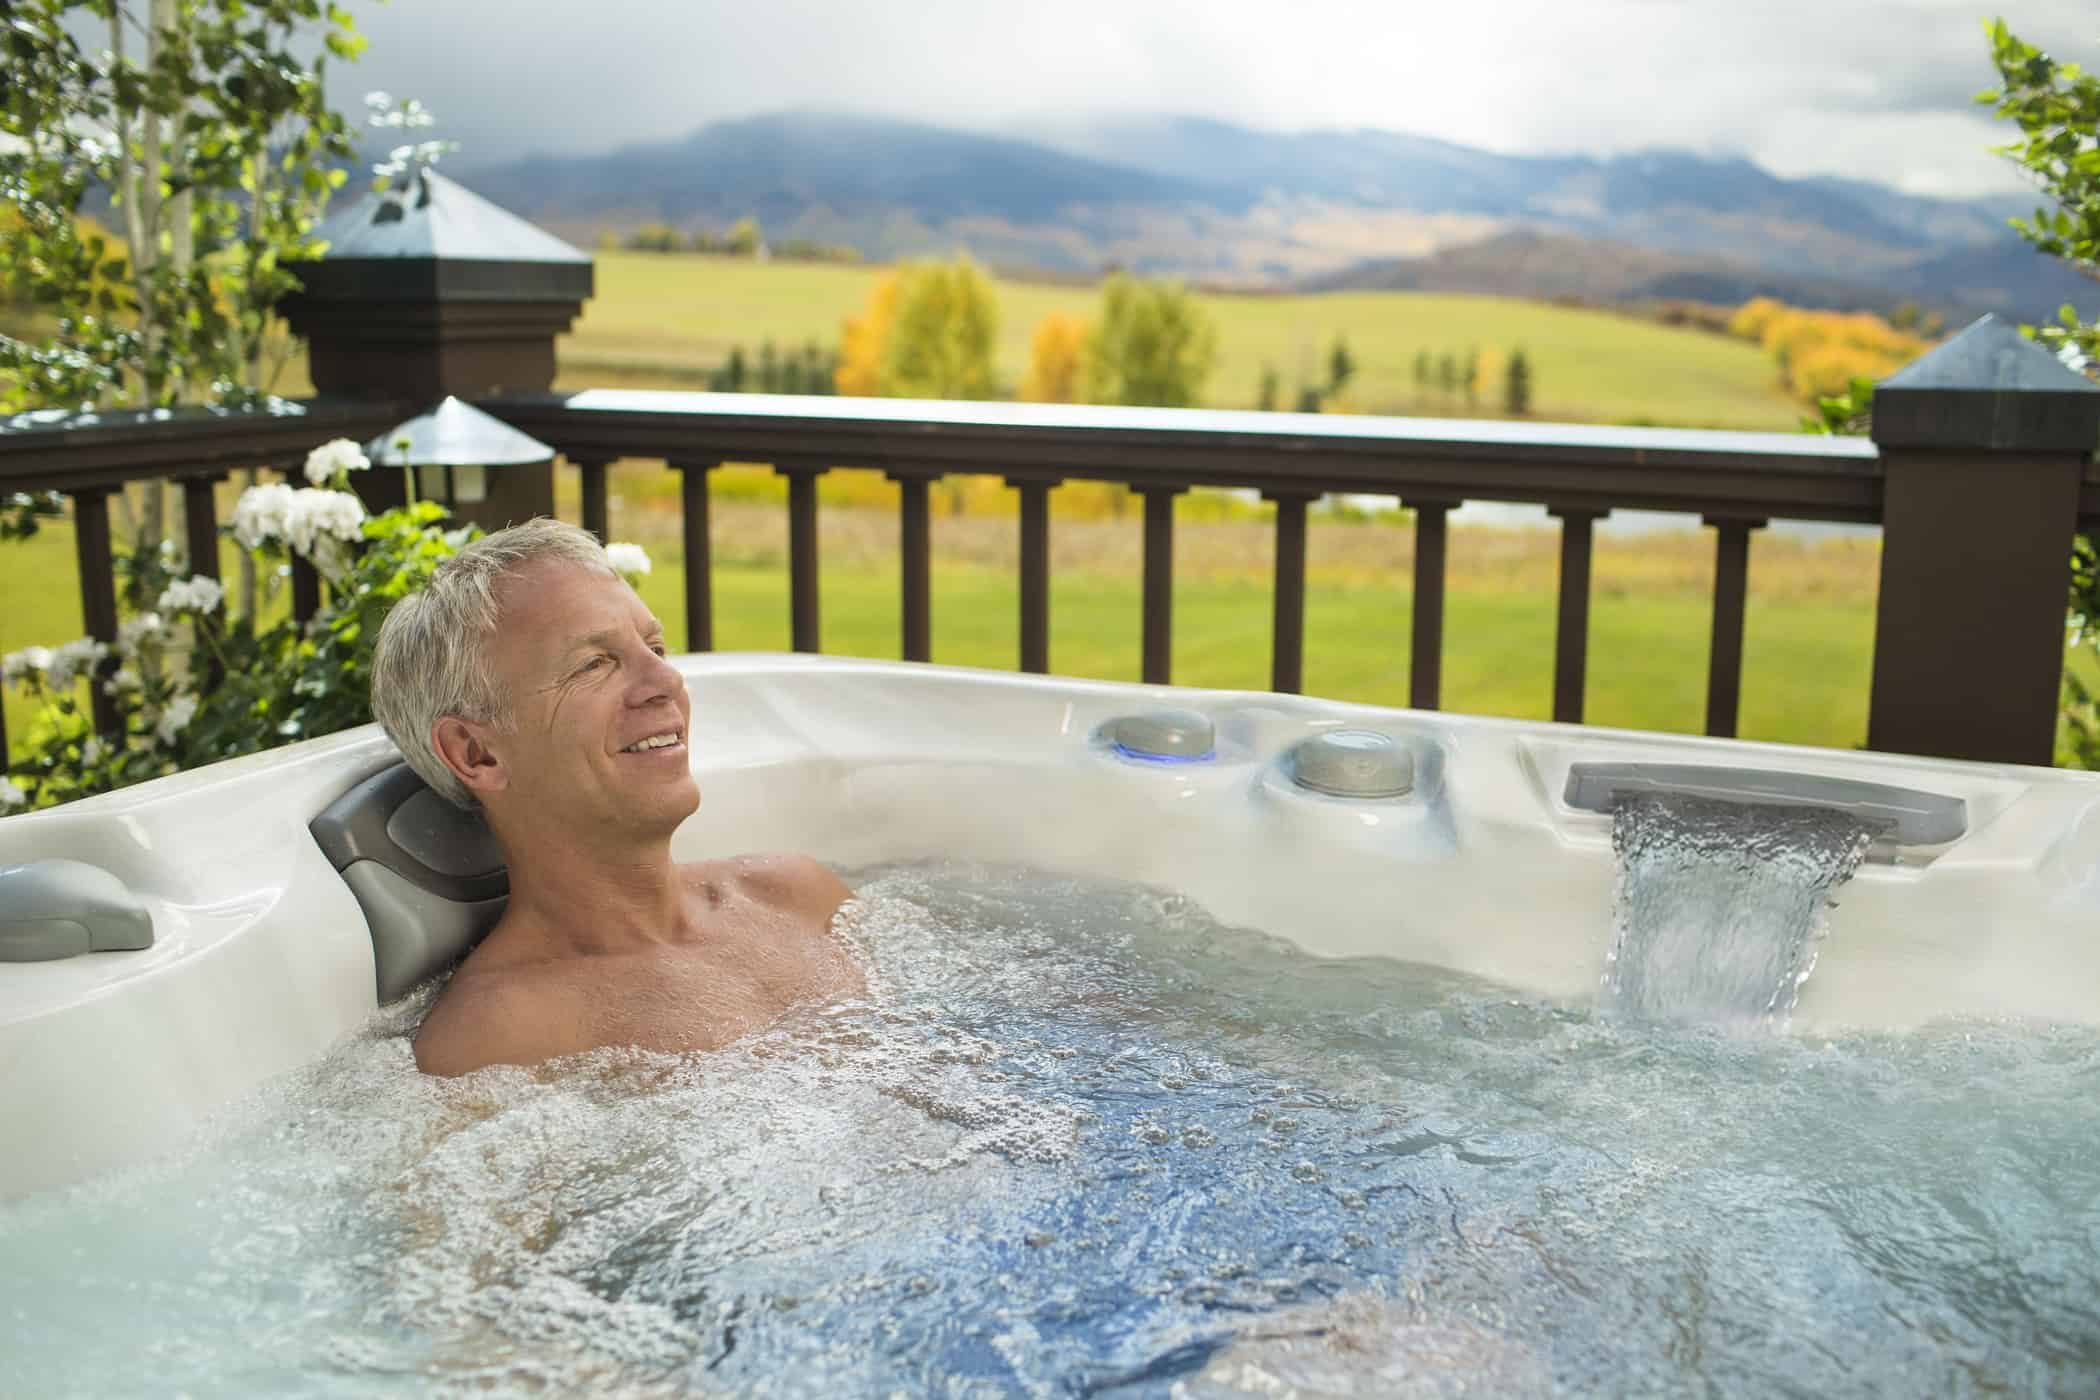 Man relaxing in hot tub.